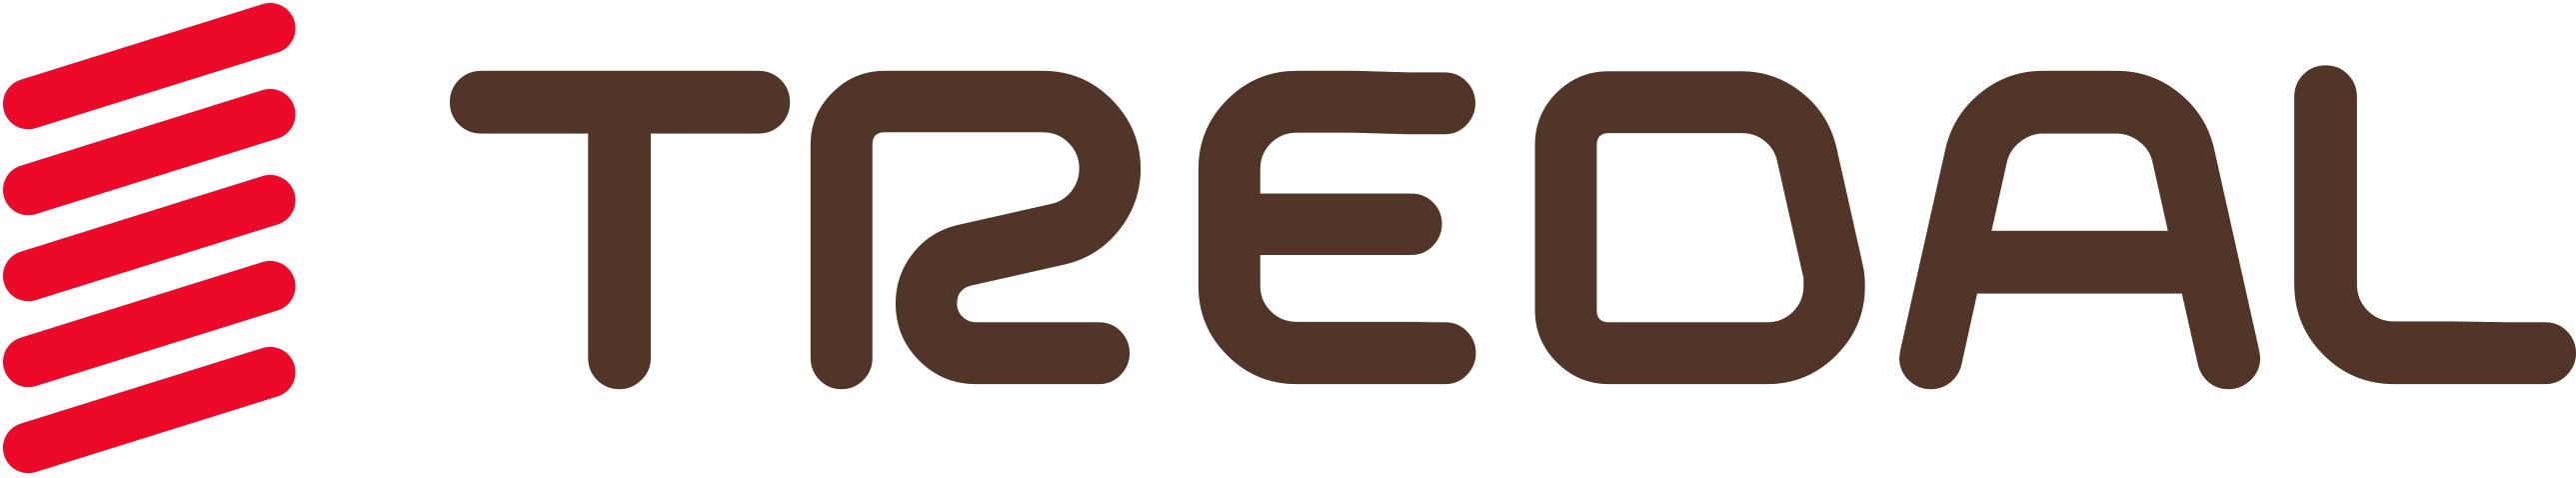 Tredal, logo